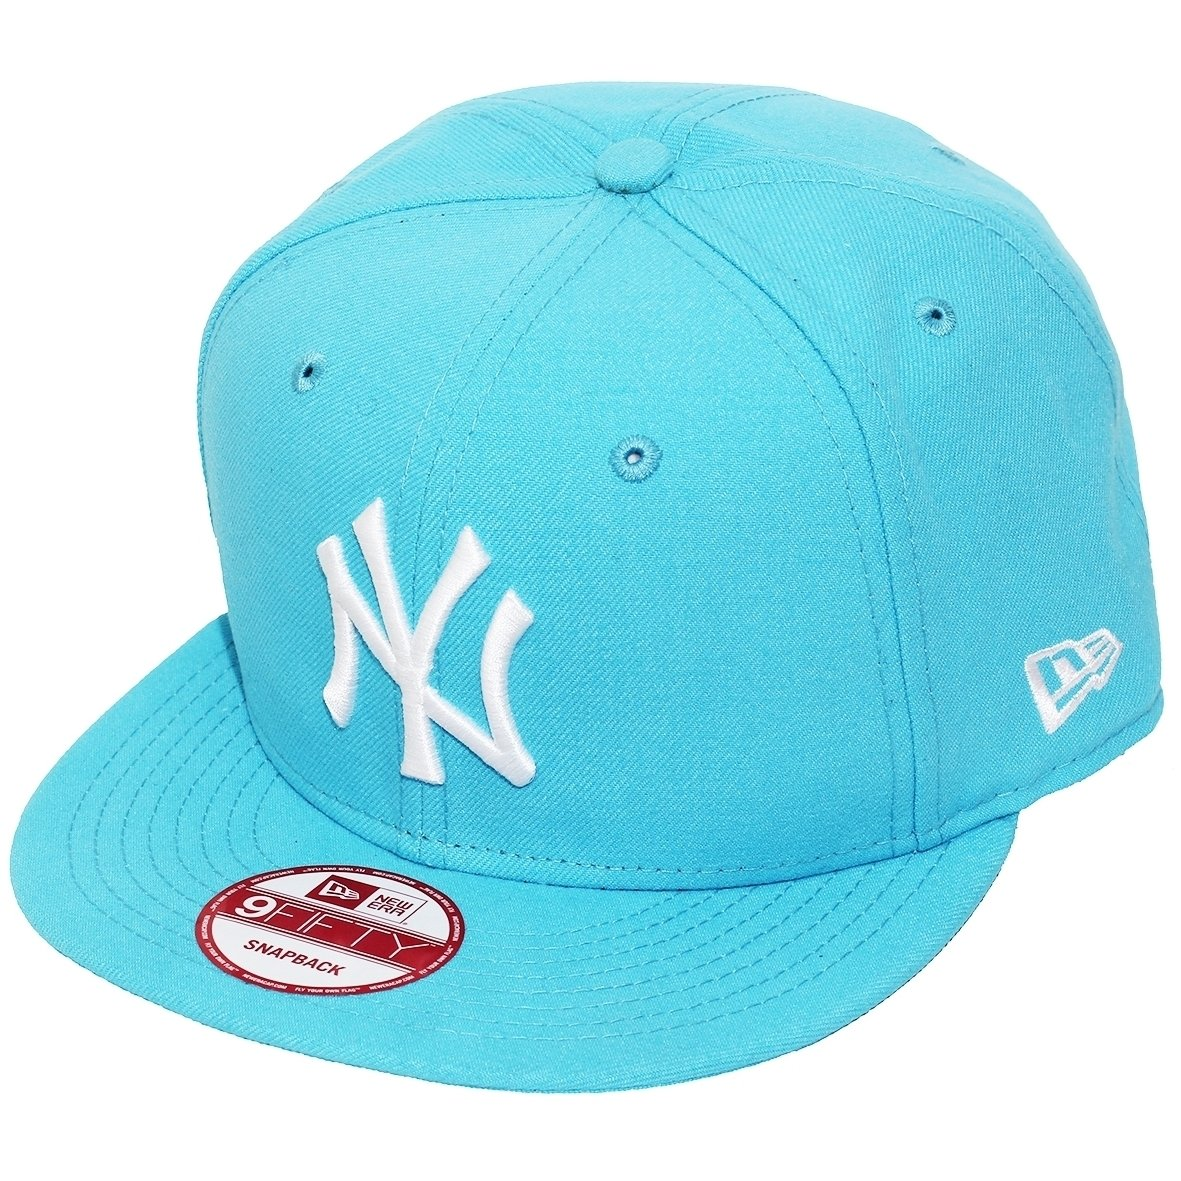 e64b6ea29b Boné New Era Aba Reta Snapback Mlb Ny Yankees Basi - Compre Agora ...